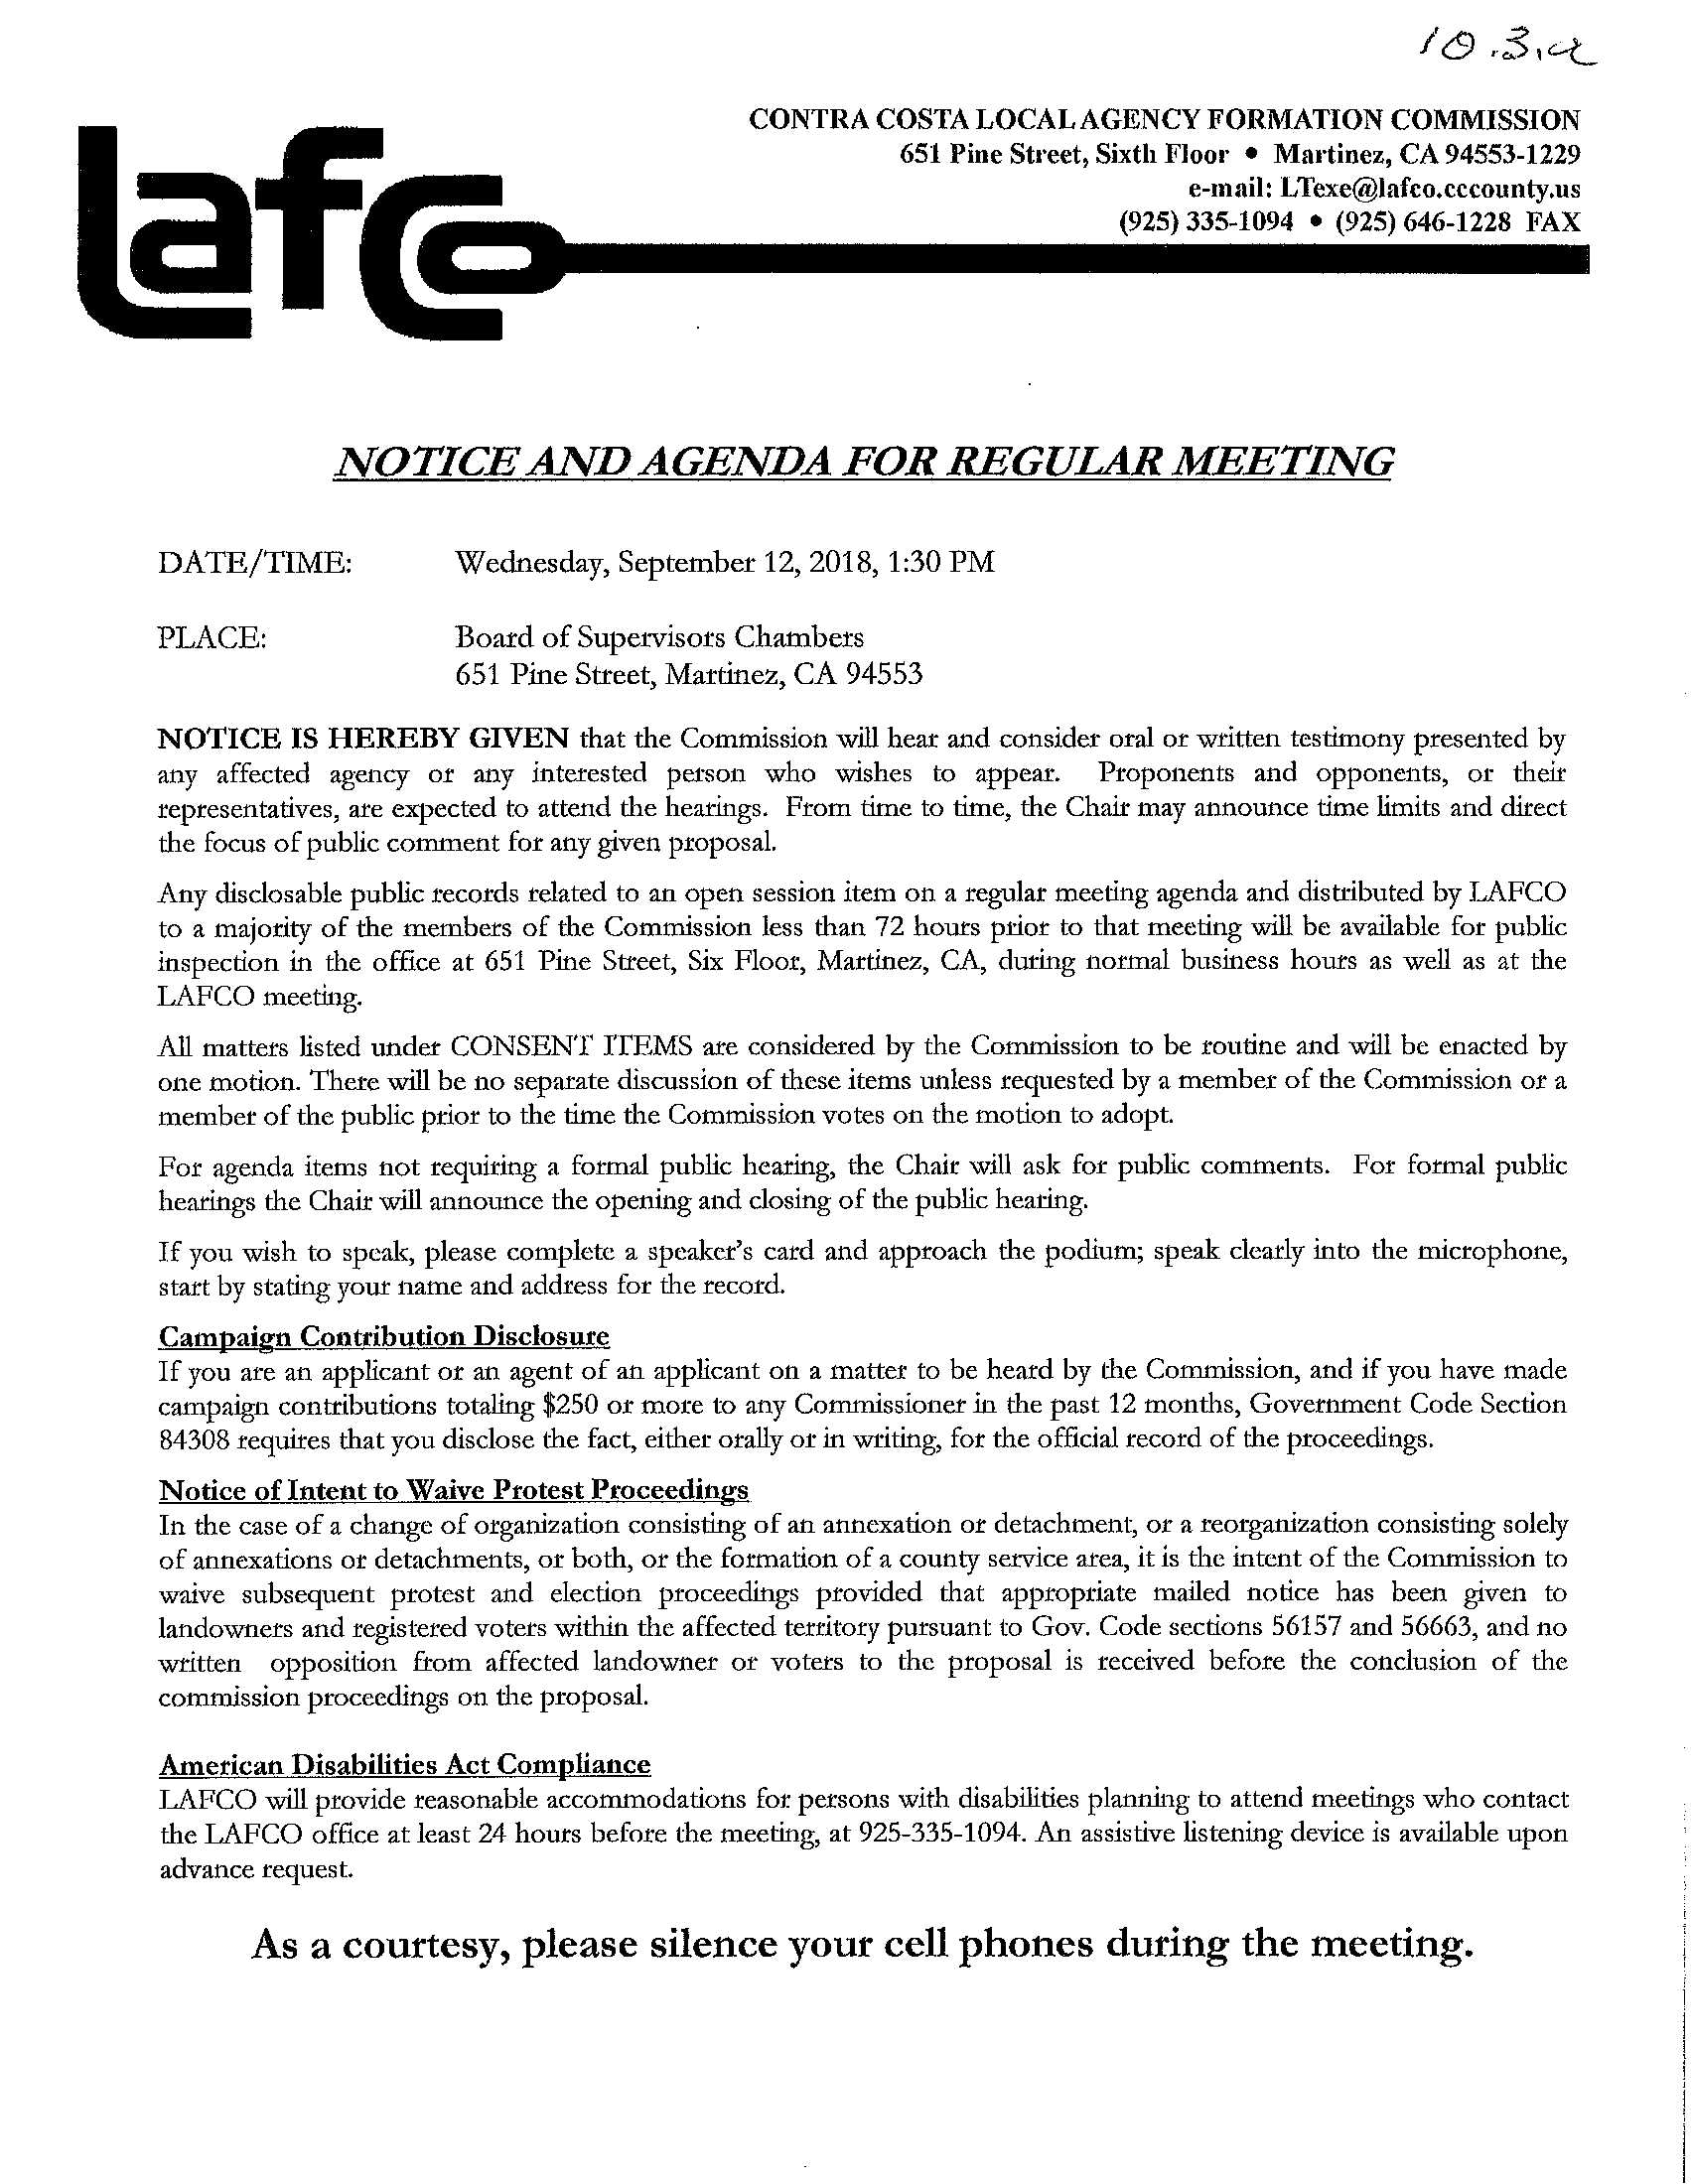 ESMAC Agenda 10.10.2018 (32 Pages)_21.jpg